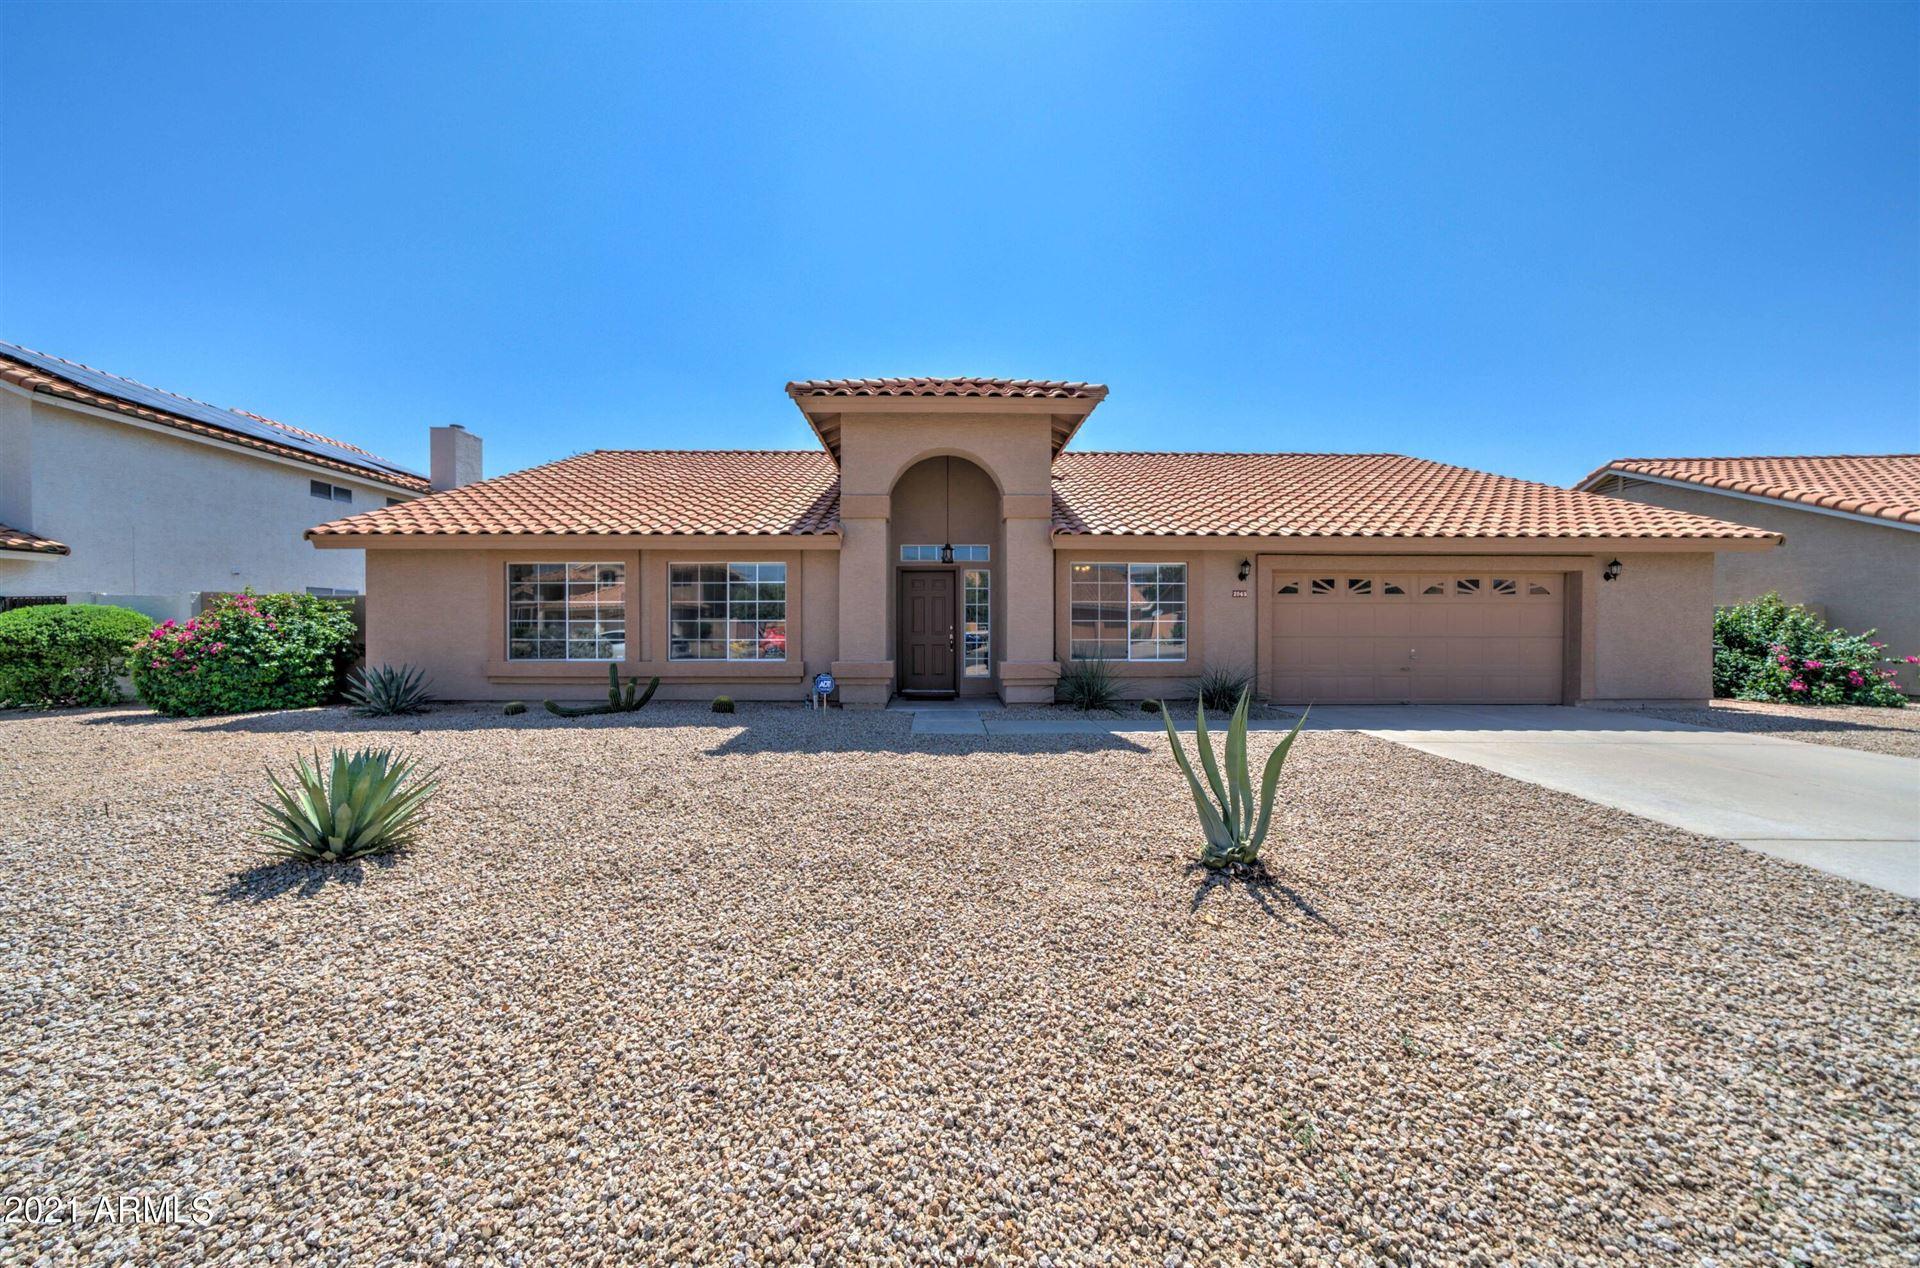 2865 E Hermosa Vista Drive, Mesa, AZ 85213 - MLS#: 6292440